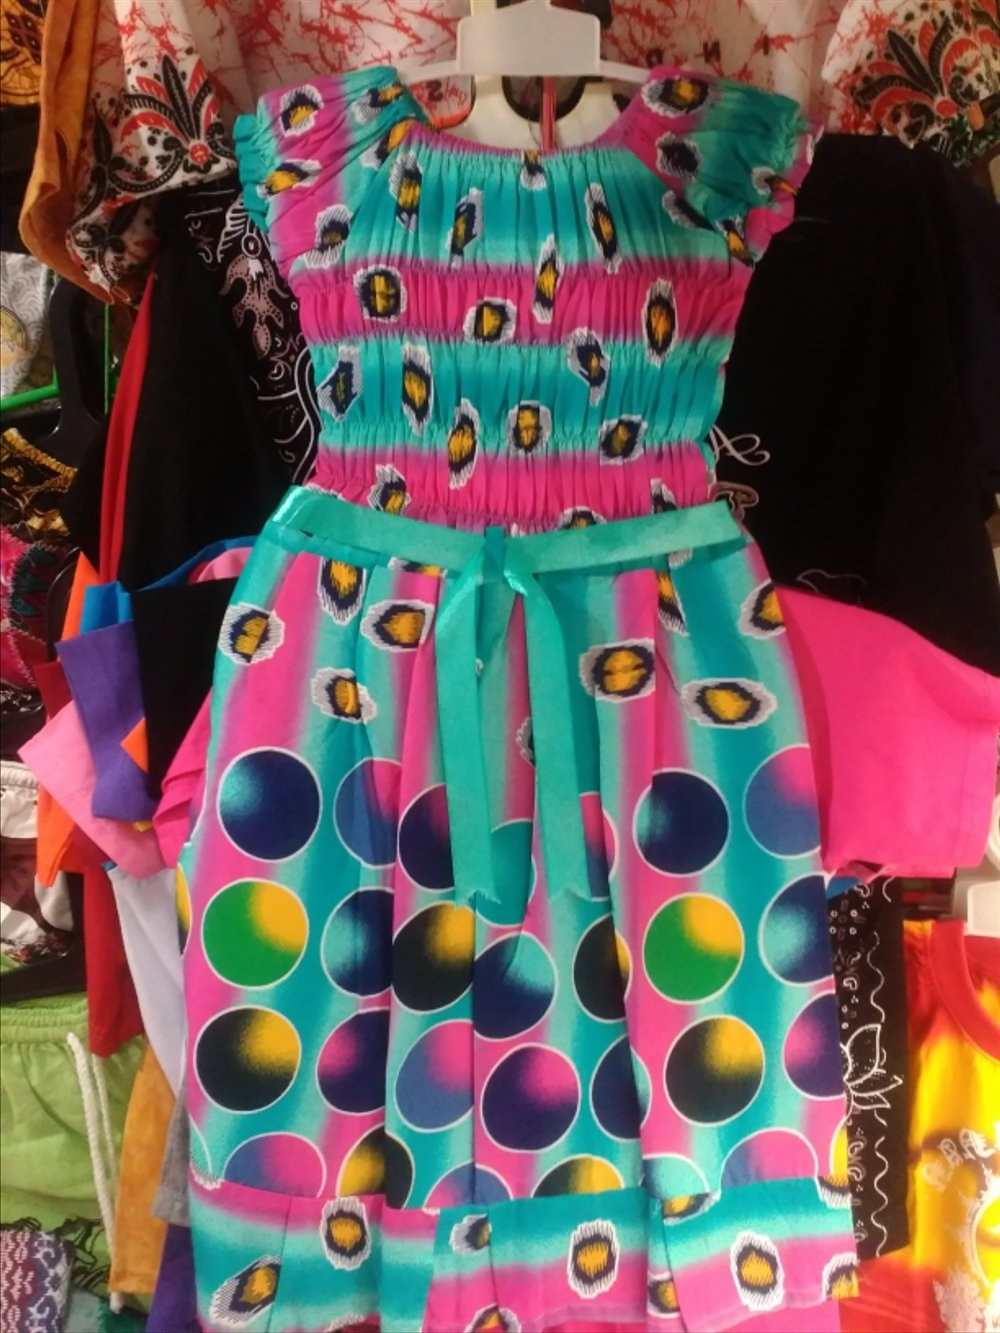 Ide Baju Lebaran Anak Usia 10 Tahun Whdr Jual Termurah Dress Batik Cantik Baju Anak Perempuan